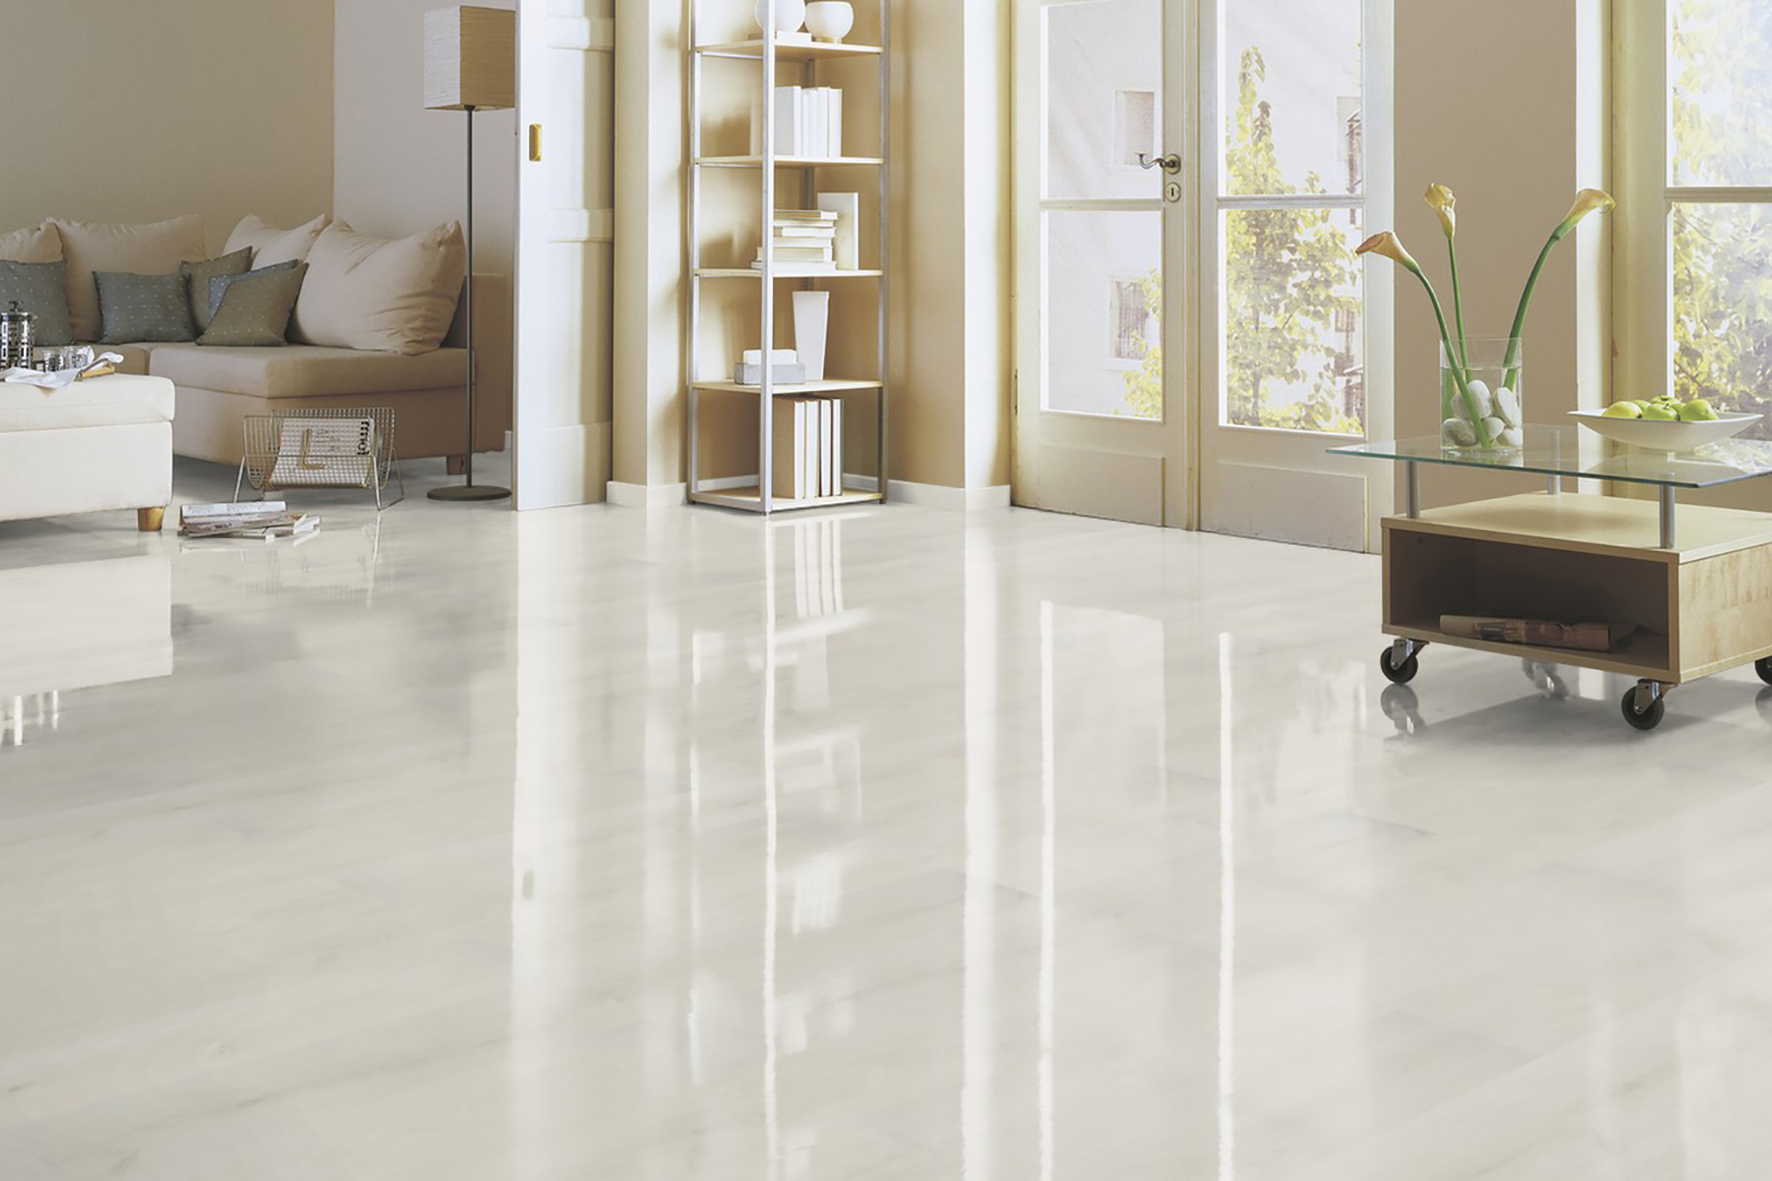 laminat hochglanz tal eiche wei shiny life glattkante. Black Bedroom Furniture Sets. Home Design Ideas